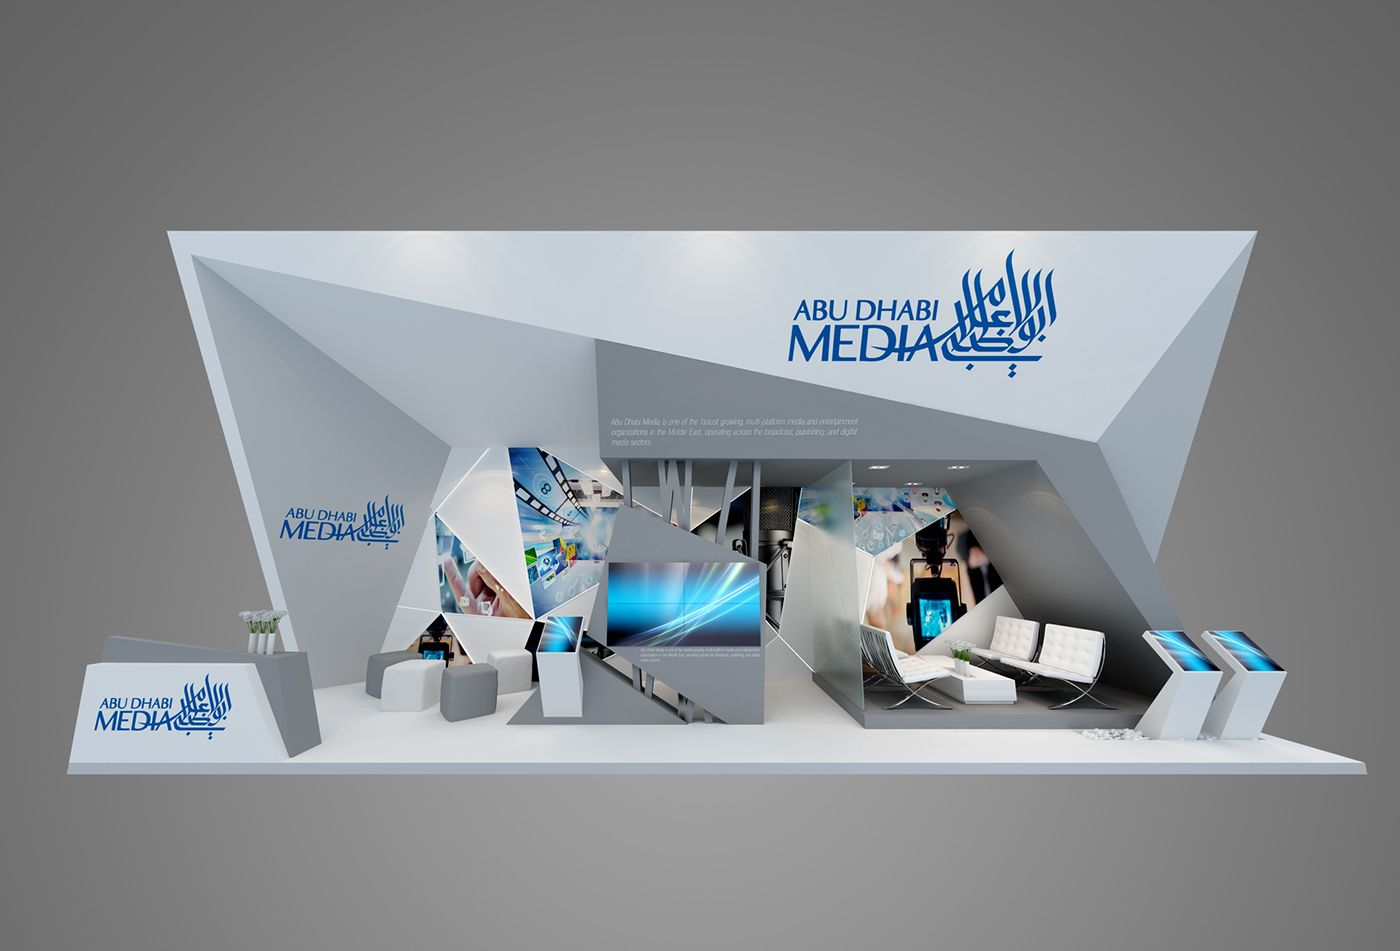 Exhibition Stand Abu Dhabi : Exhibition stand companies in dubai abu dhabi uae